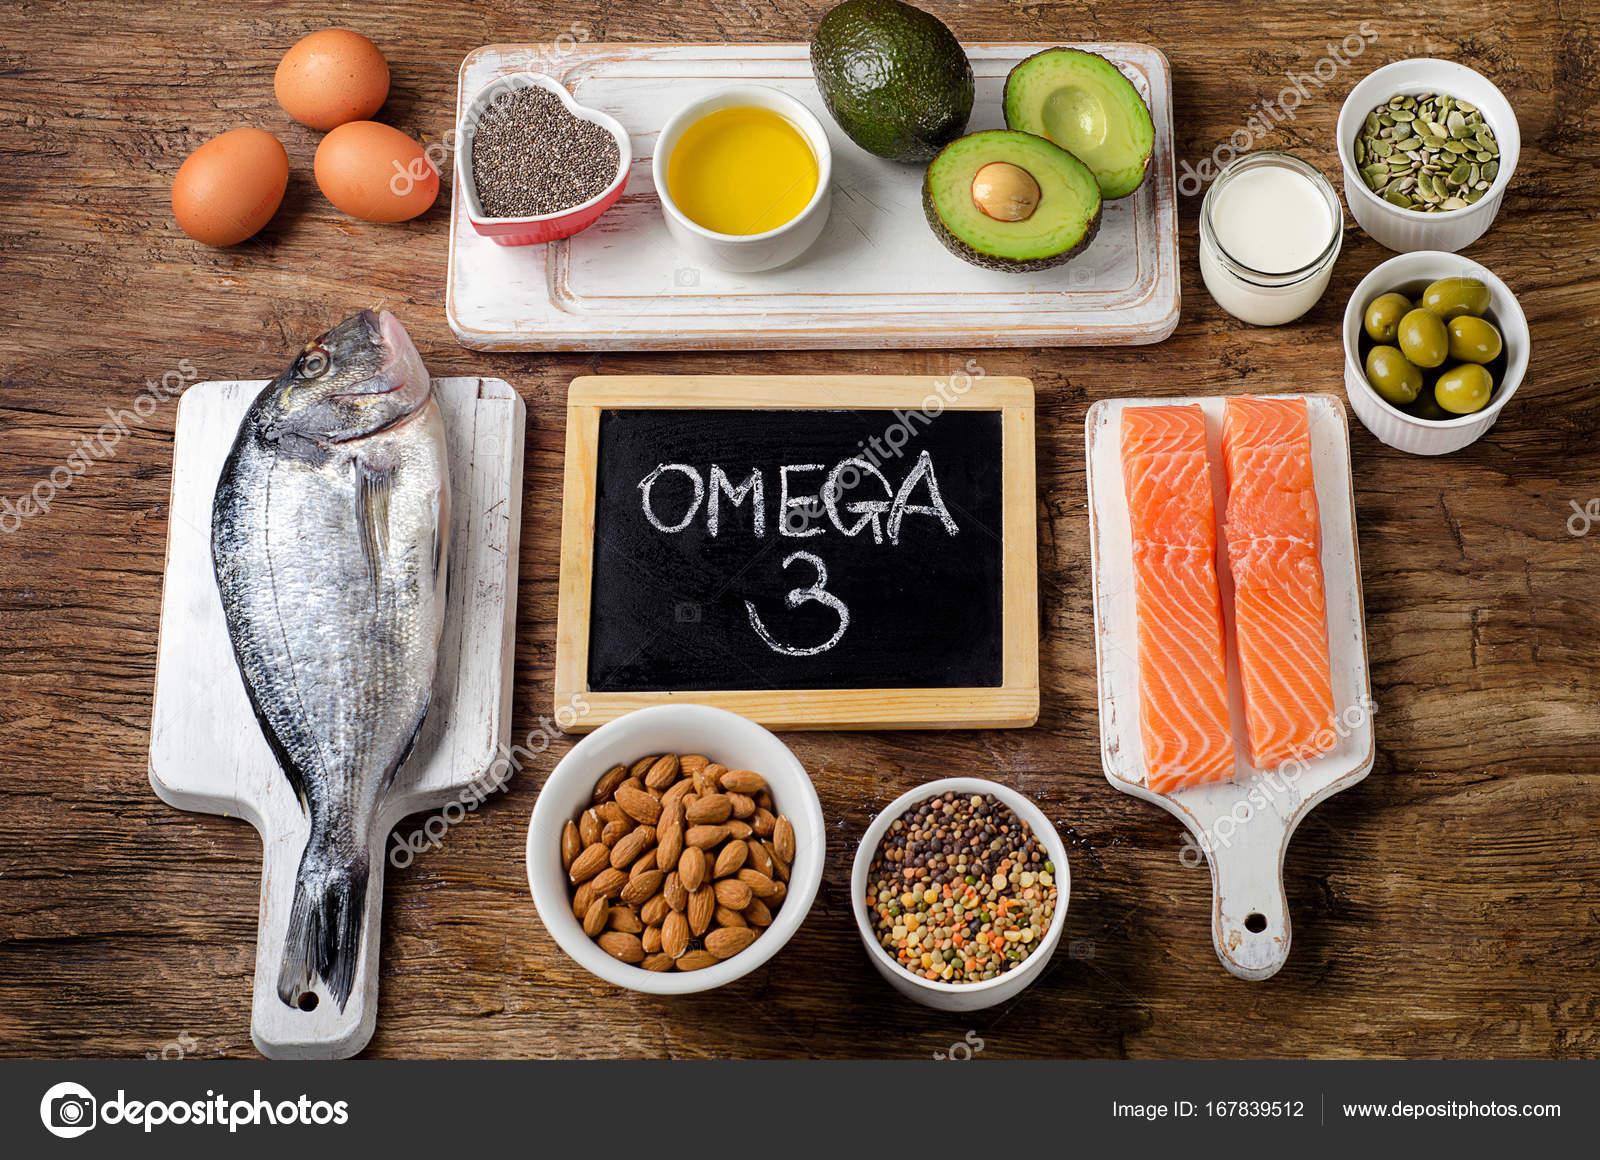 omega 3 mat